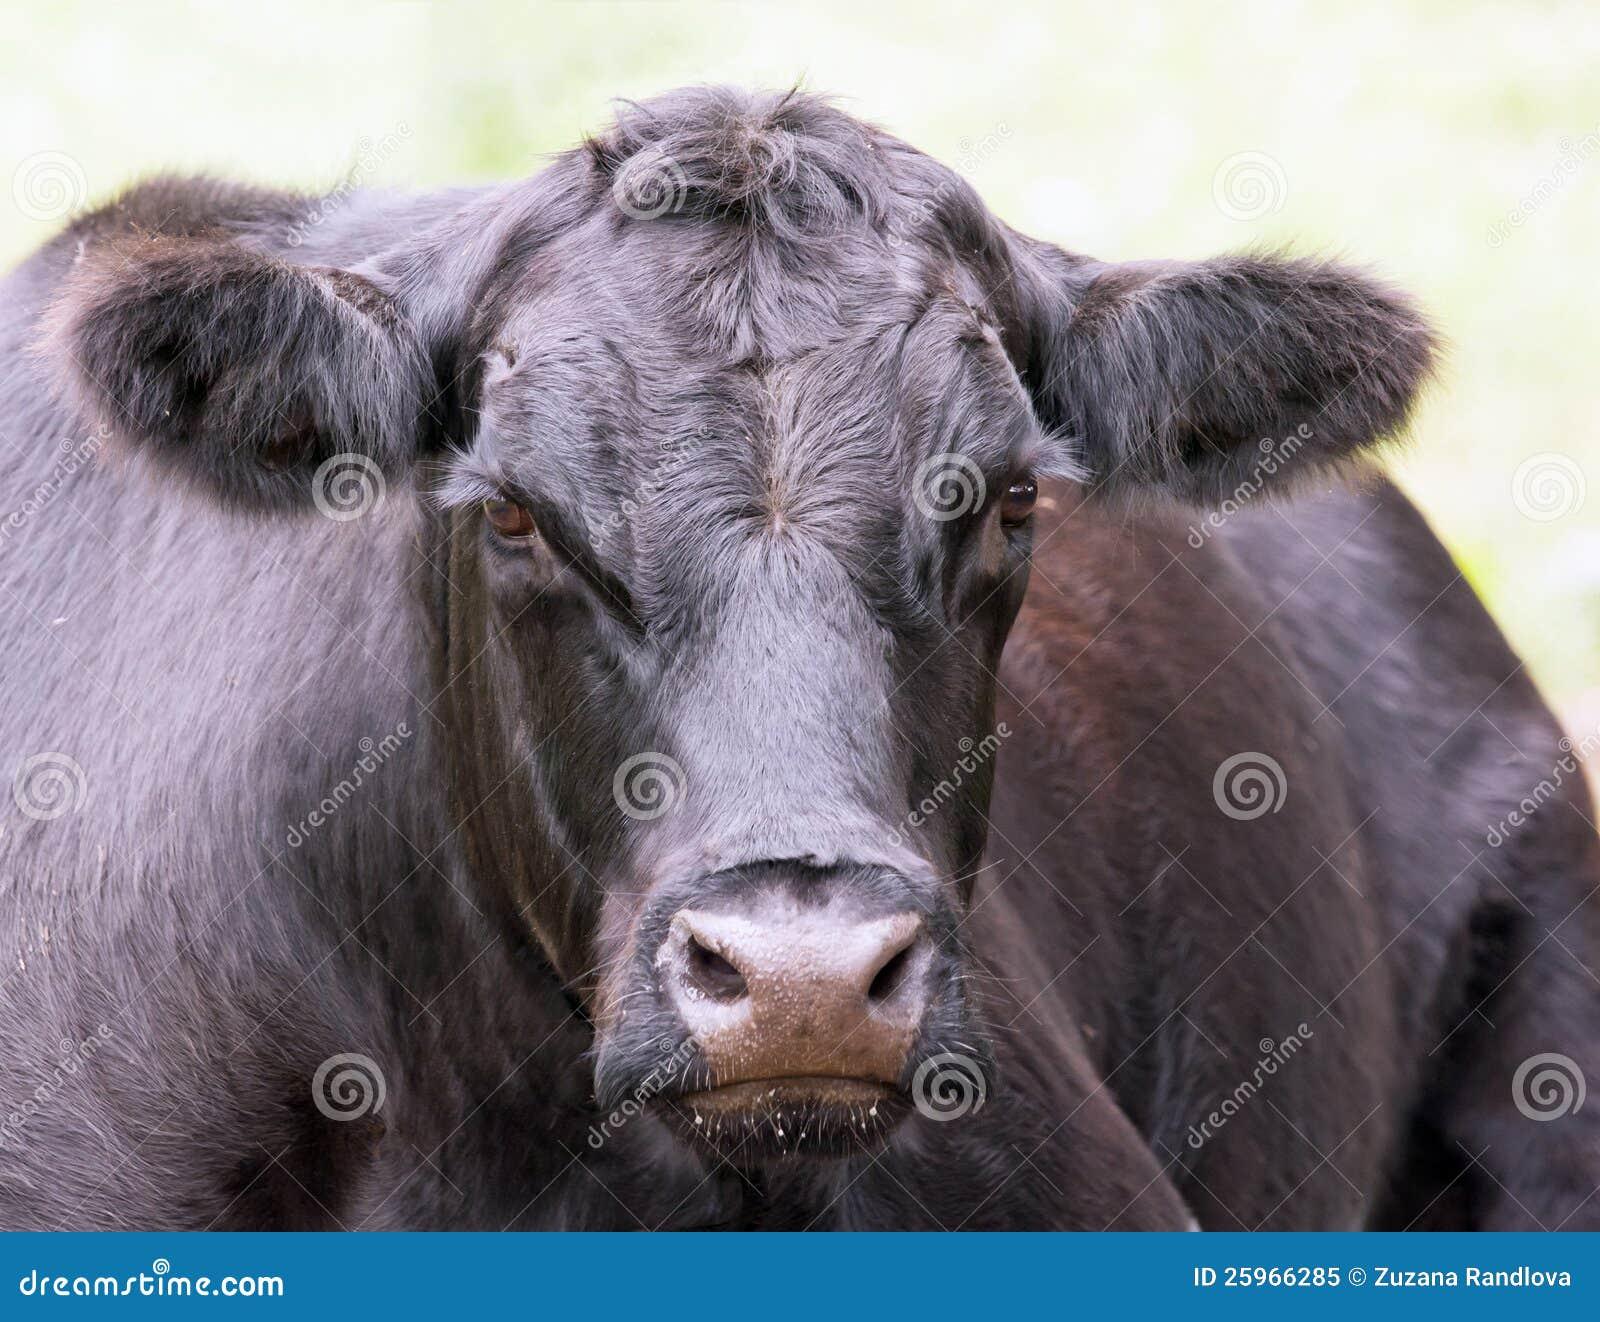 Black Cow Royalty Free Stock Photo - Image: 25966285